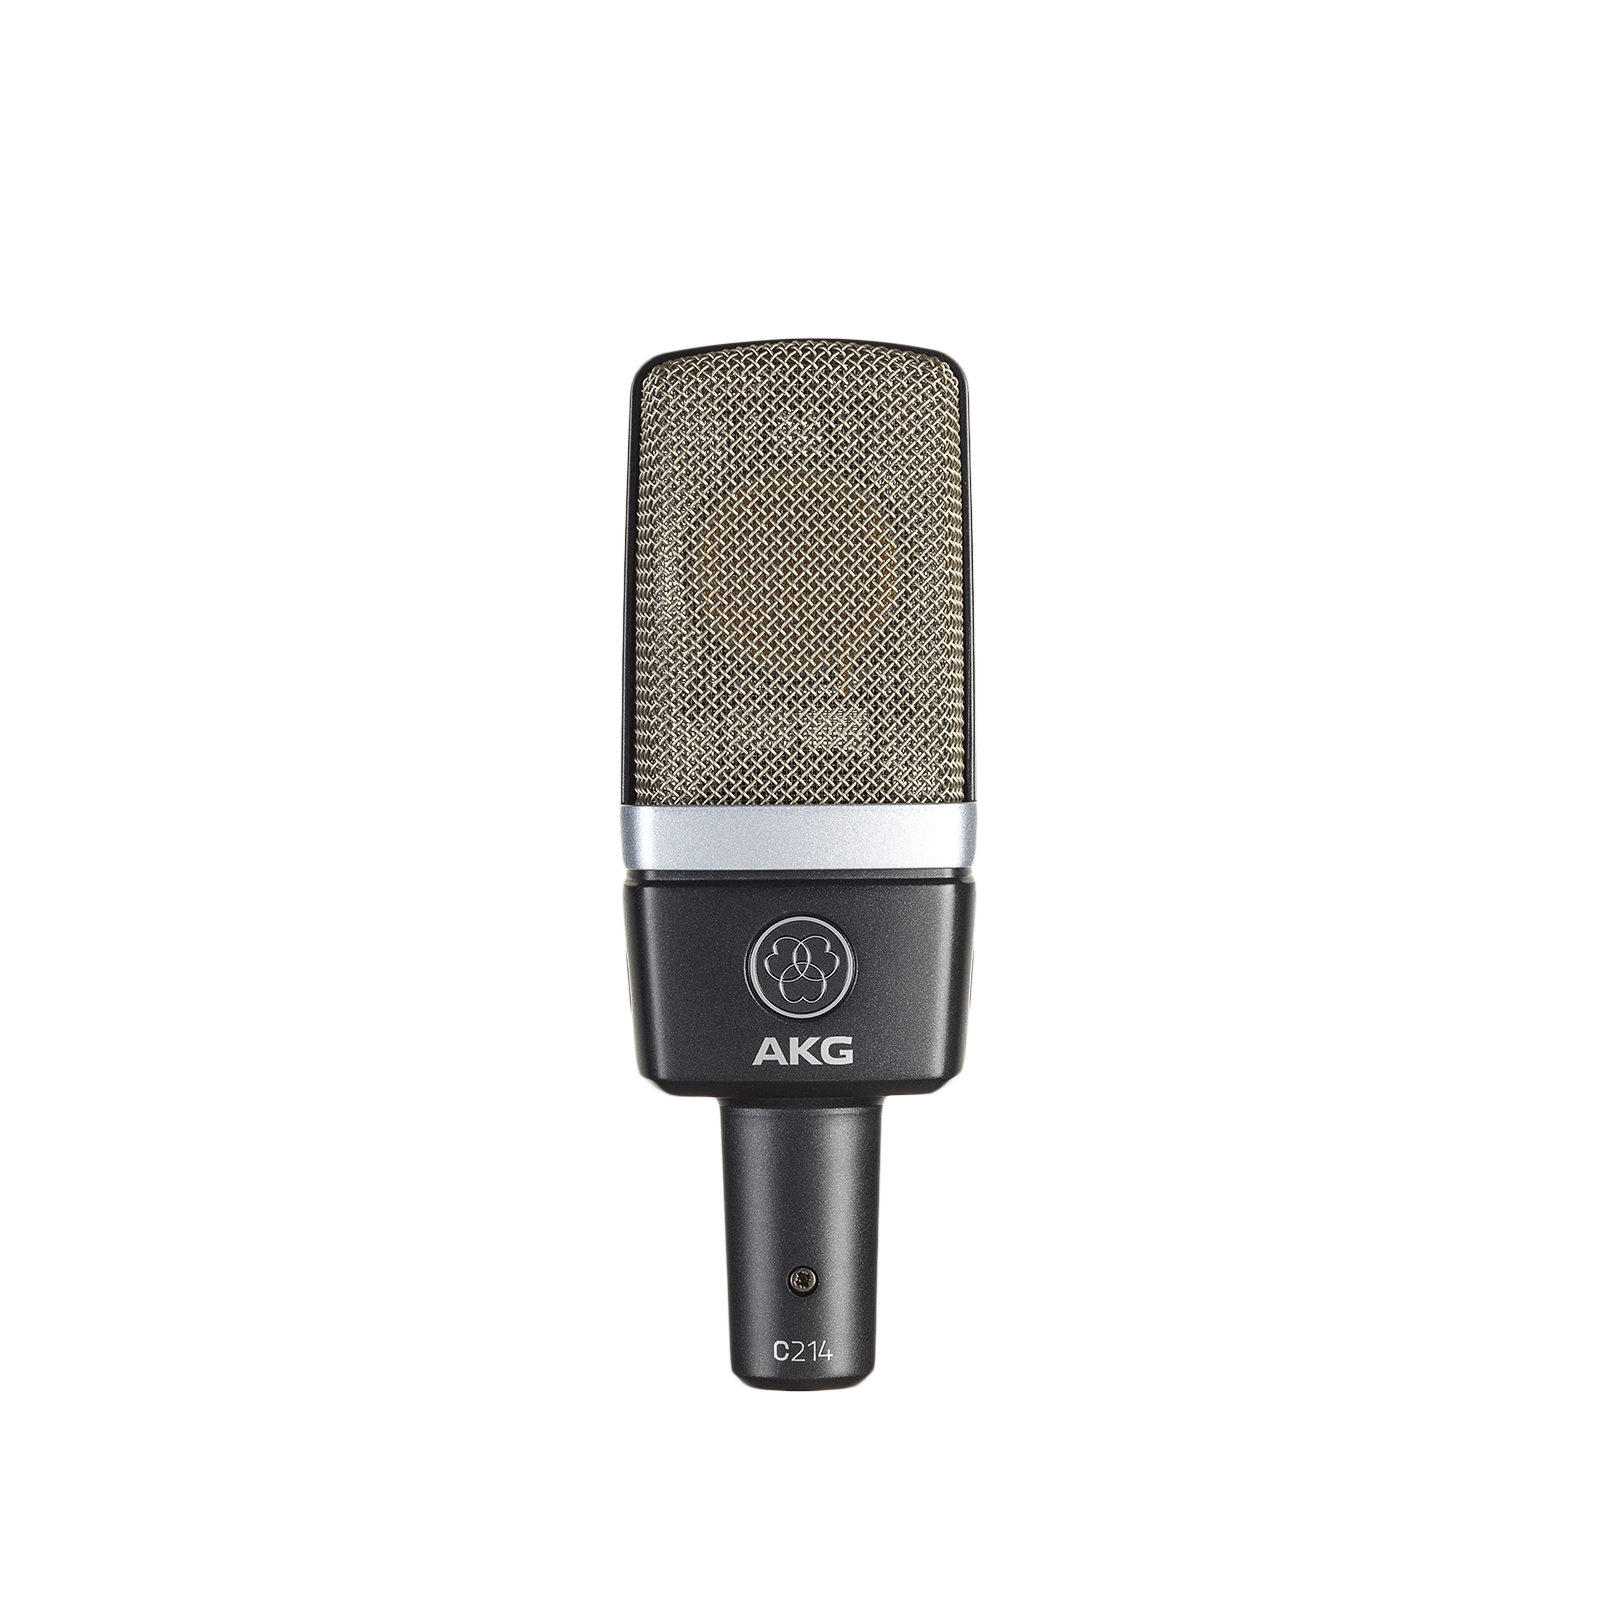 1605x1605 C214 Professional Large Diaphragm Condenser Microphone